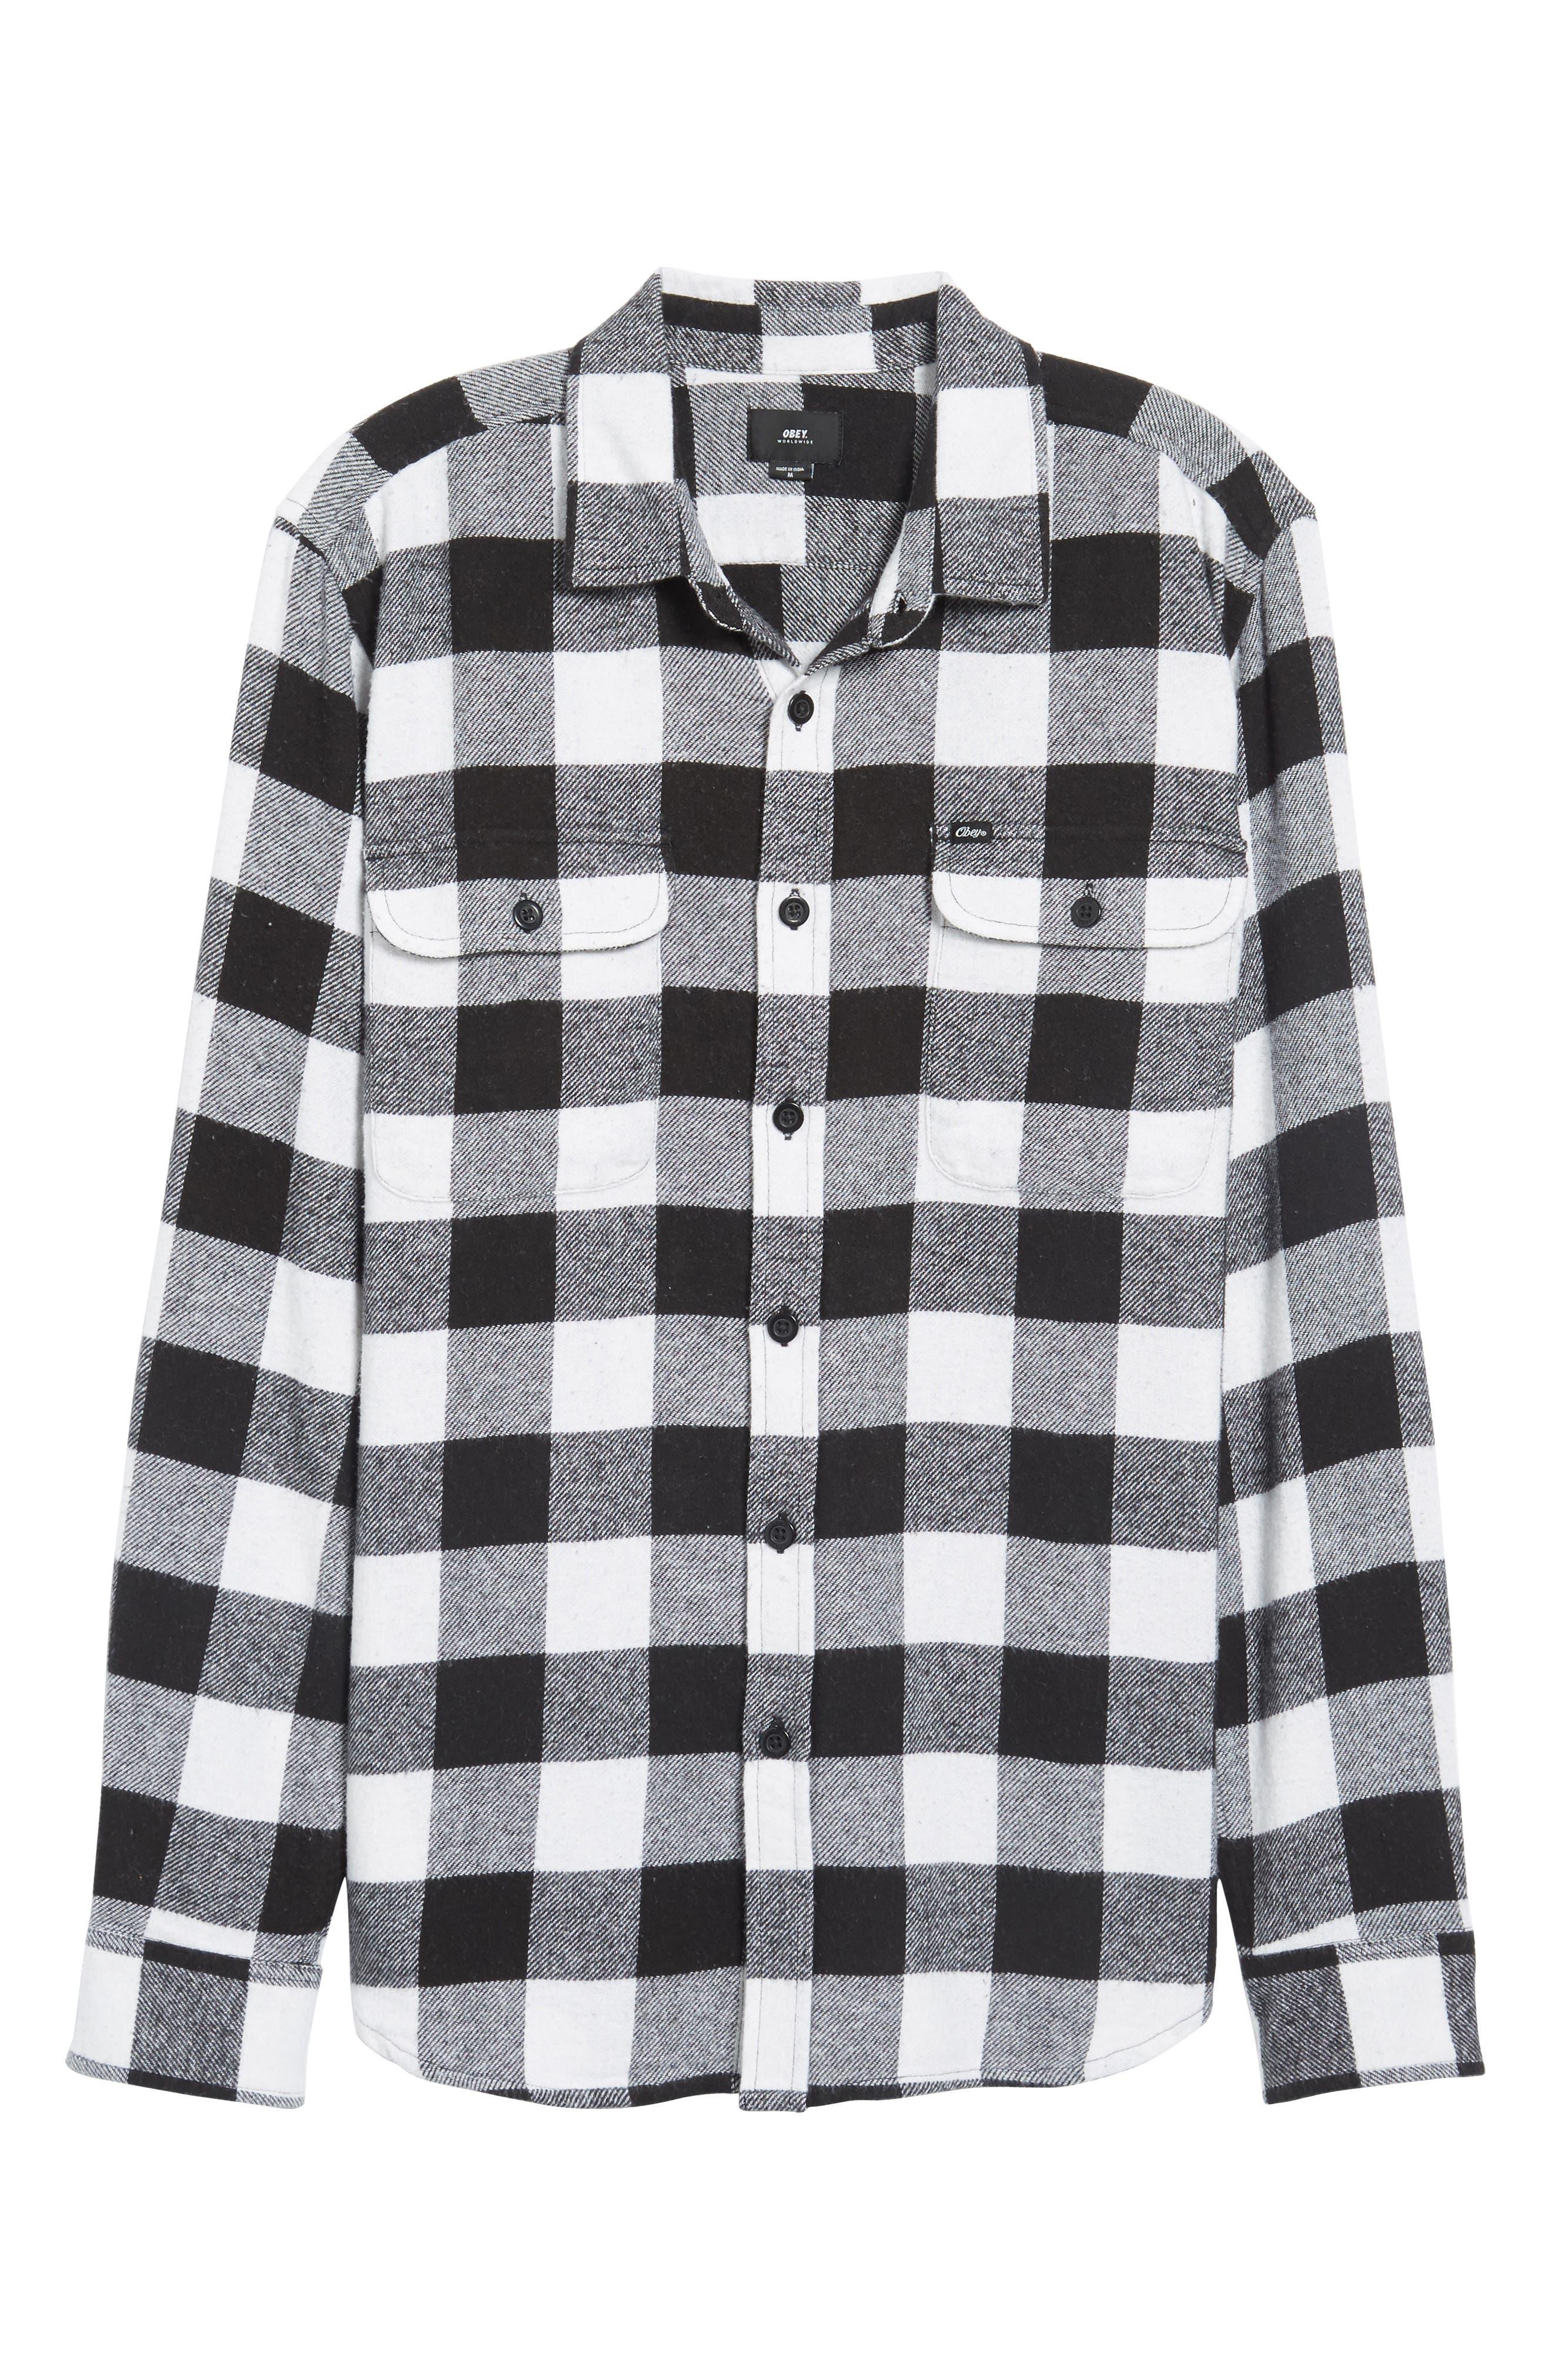 Trent Check Woven Shirt,                             Alternate thumbnail 6, color,                             002